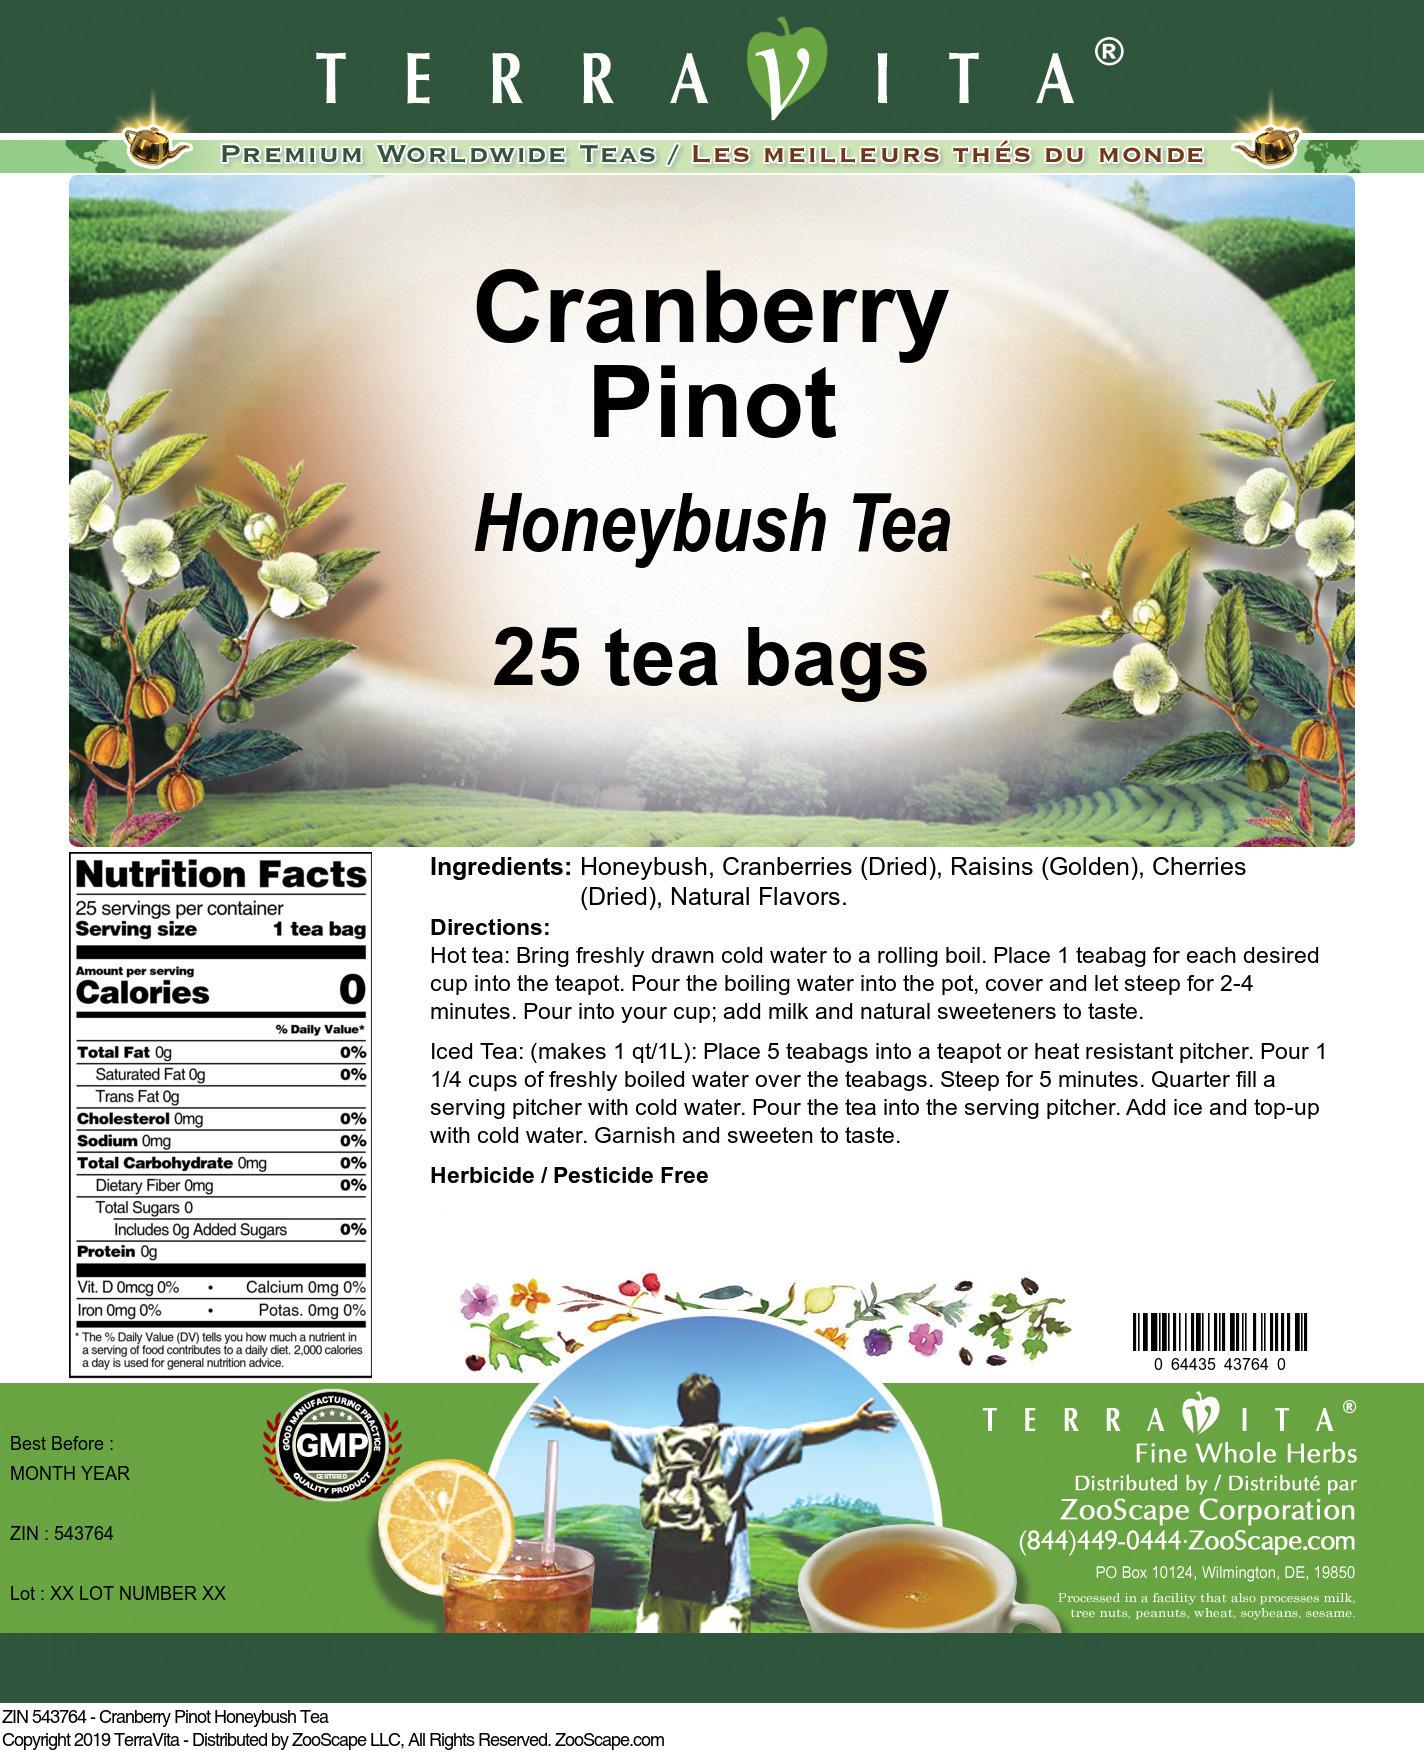 Cranberry Pinot Honeybush Tea